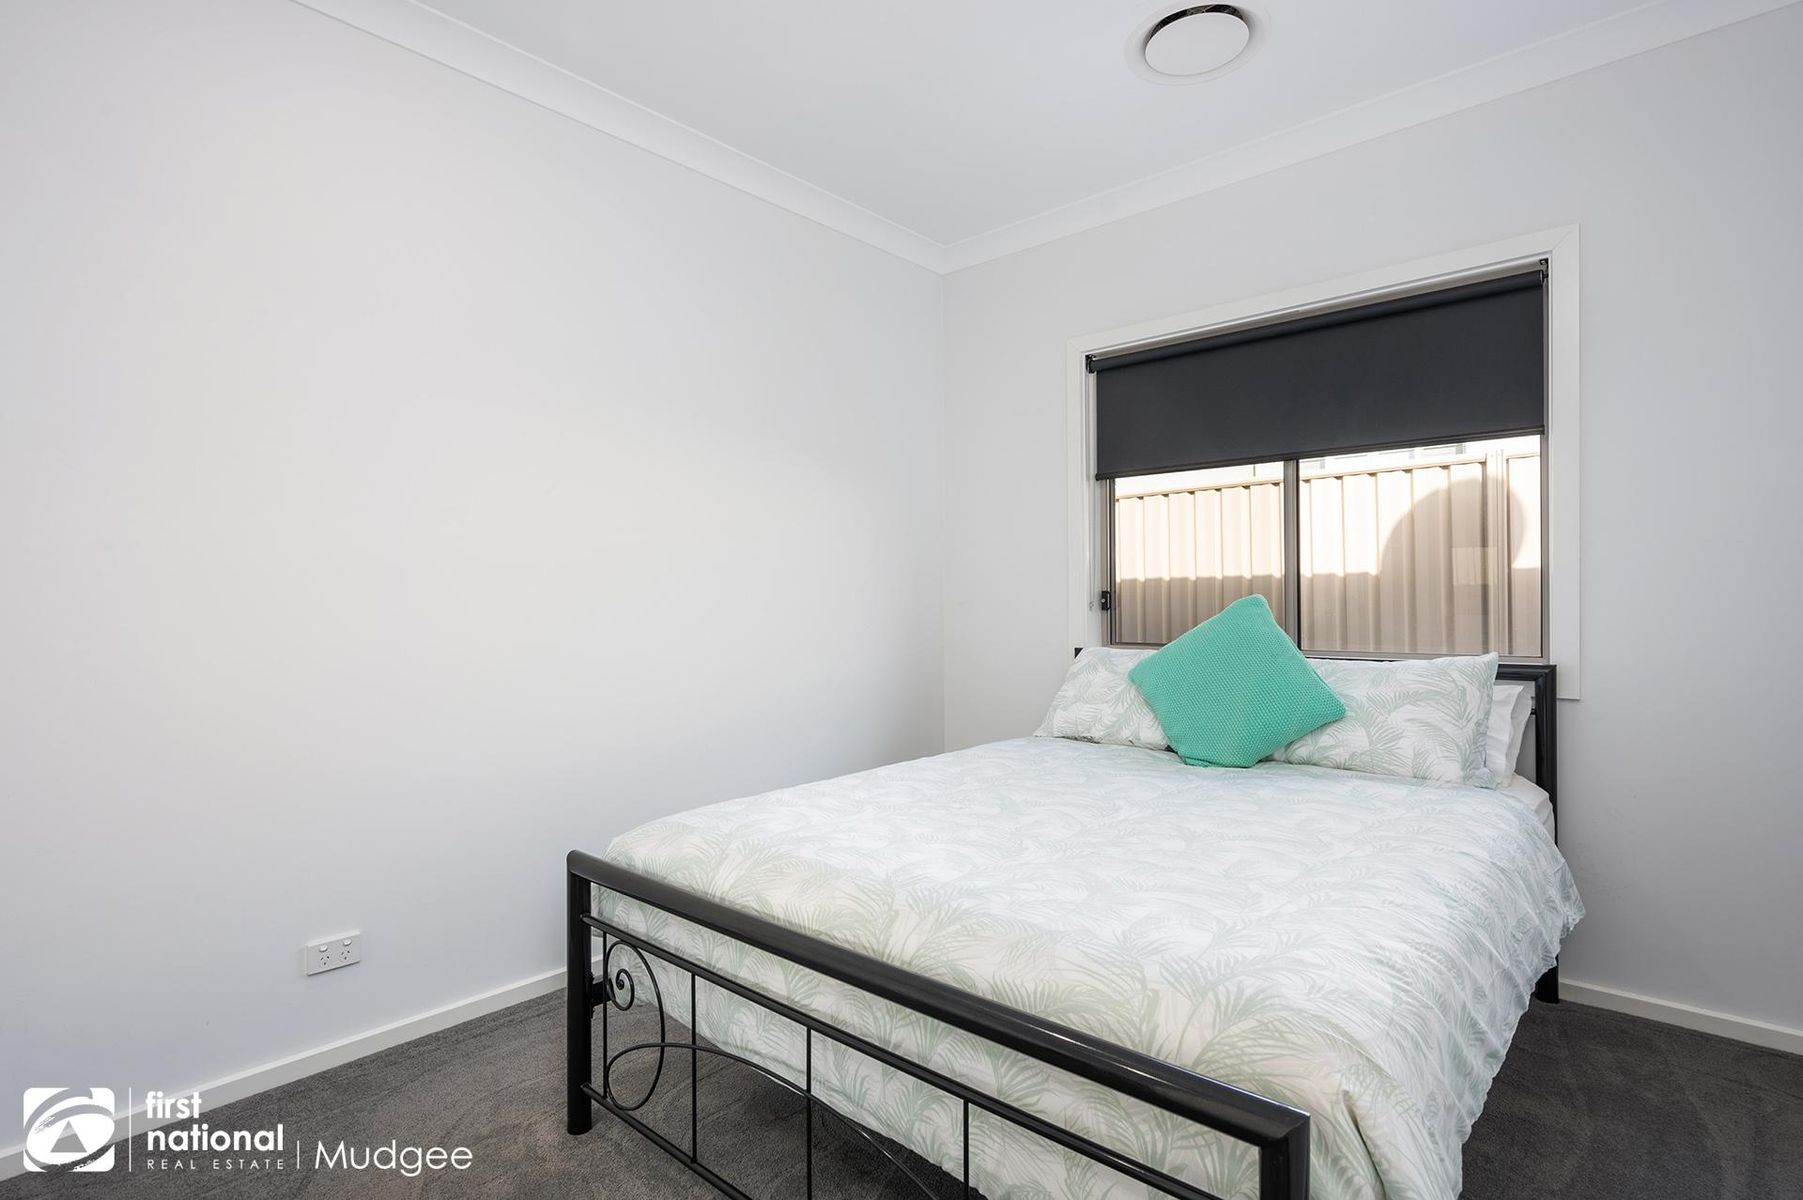 48 Melton Road, Mudgee, NSW 2850